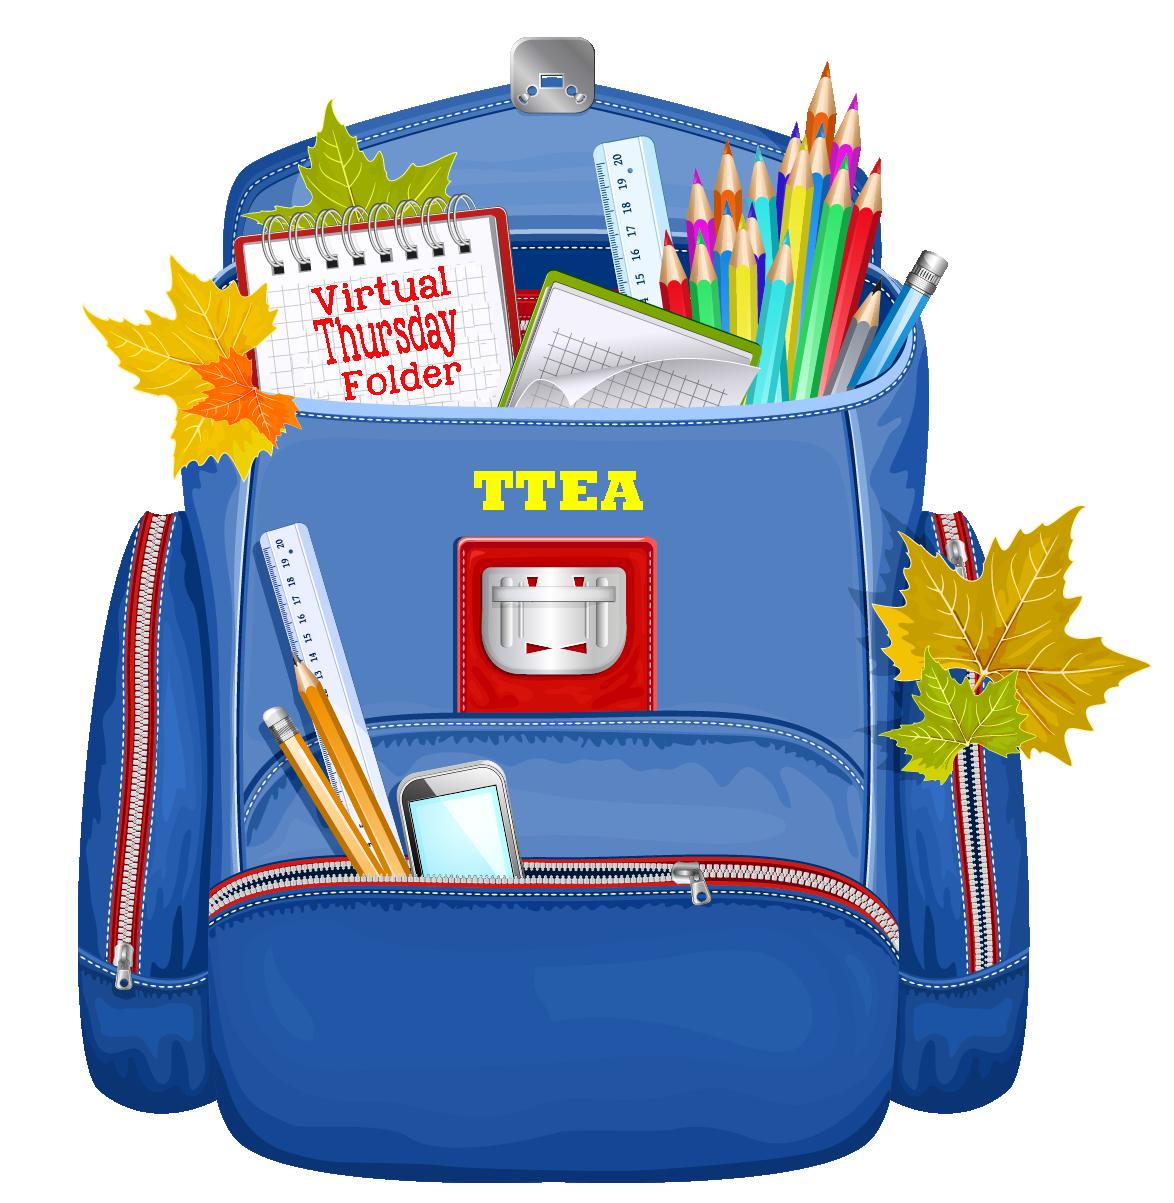 Ttea virtual tuesday tuesdays. Backpack clipart folder